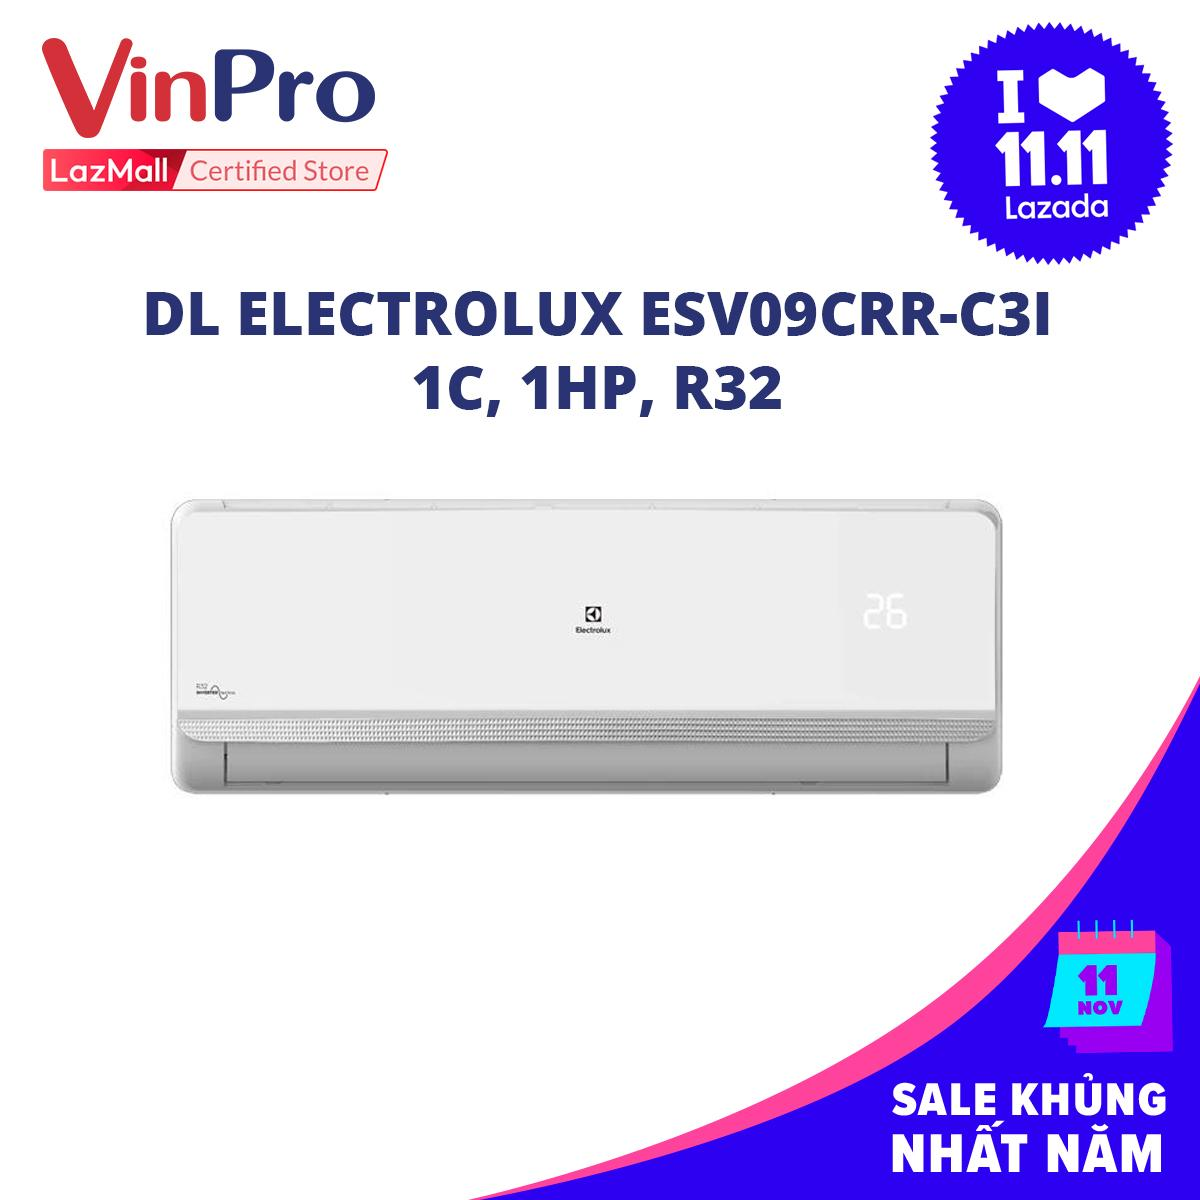 Bảng giá Máy lạnh Electrolux ESV09CRR-C3I, 1C, 1HP, R32